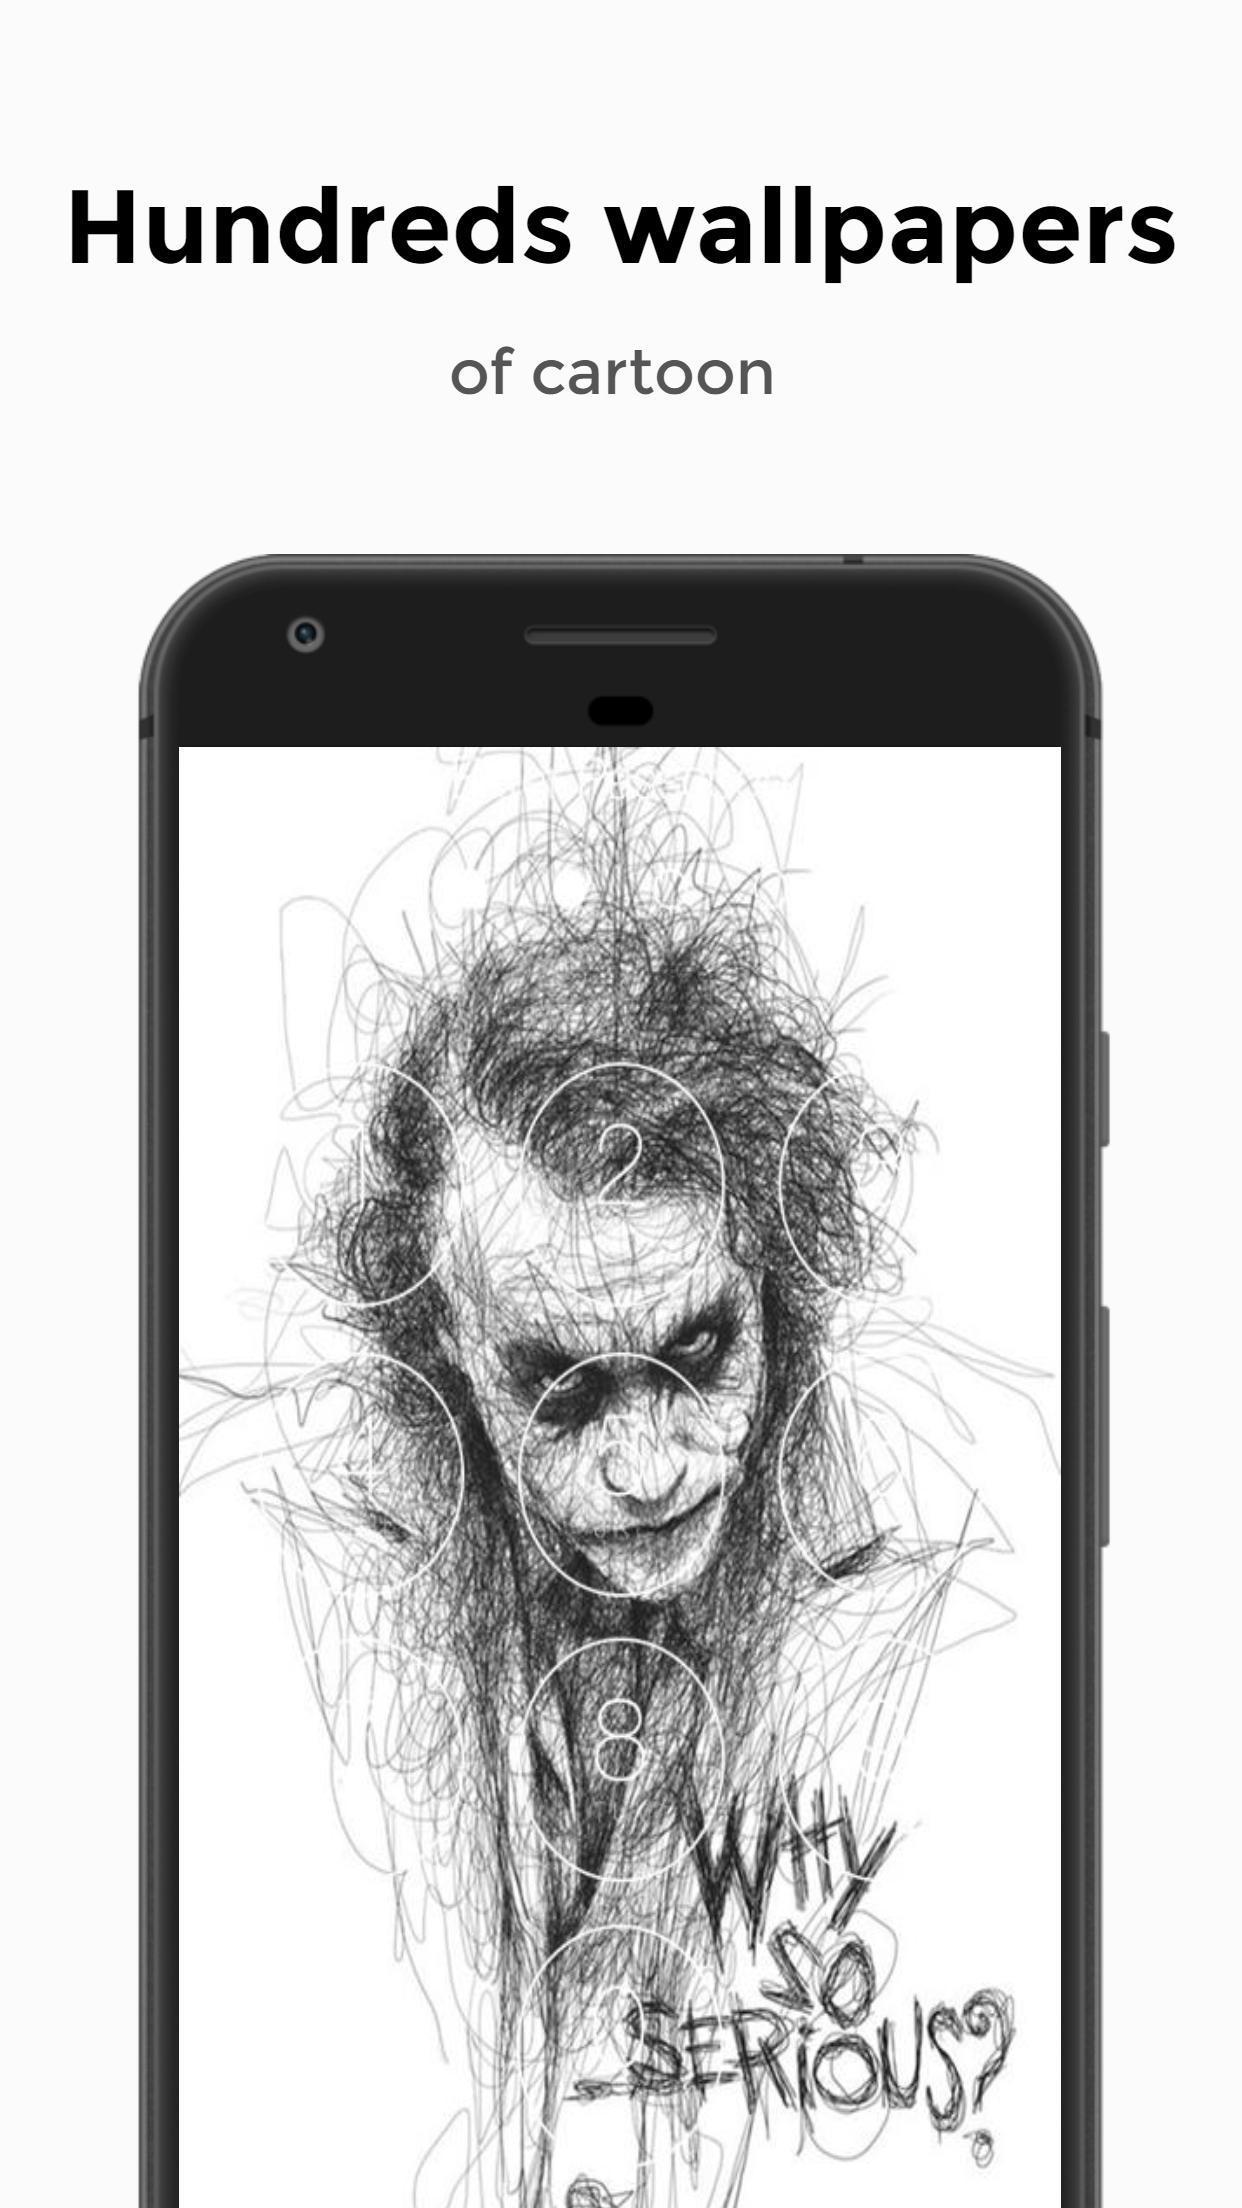 Joker Lock Screen Wallpaper For Android Apk Download